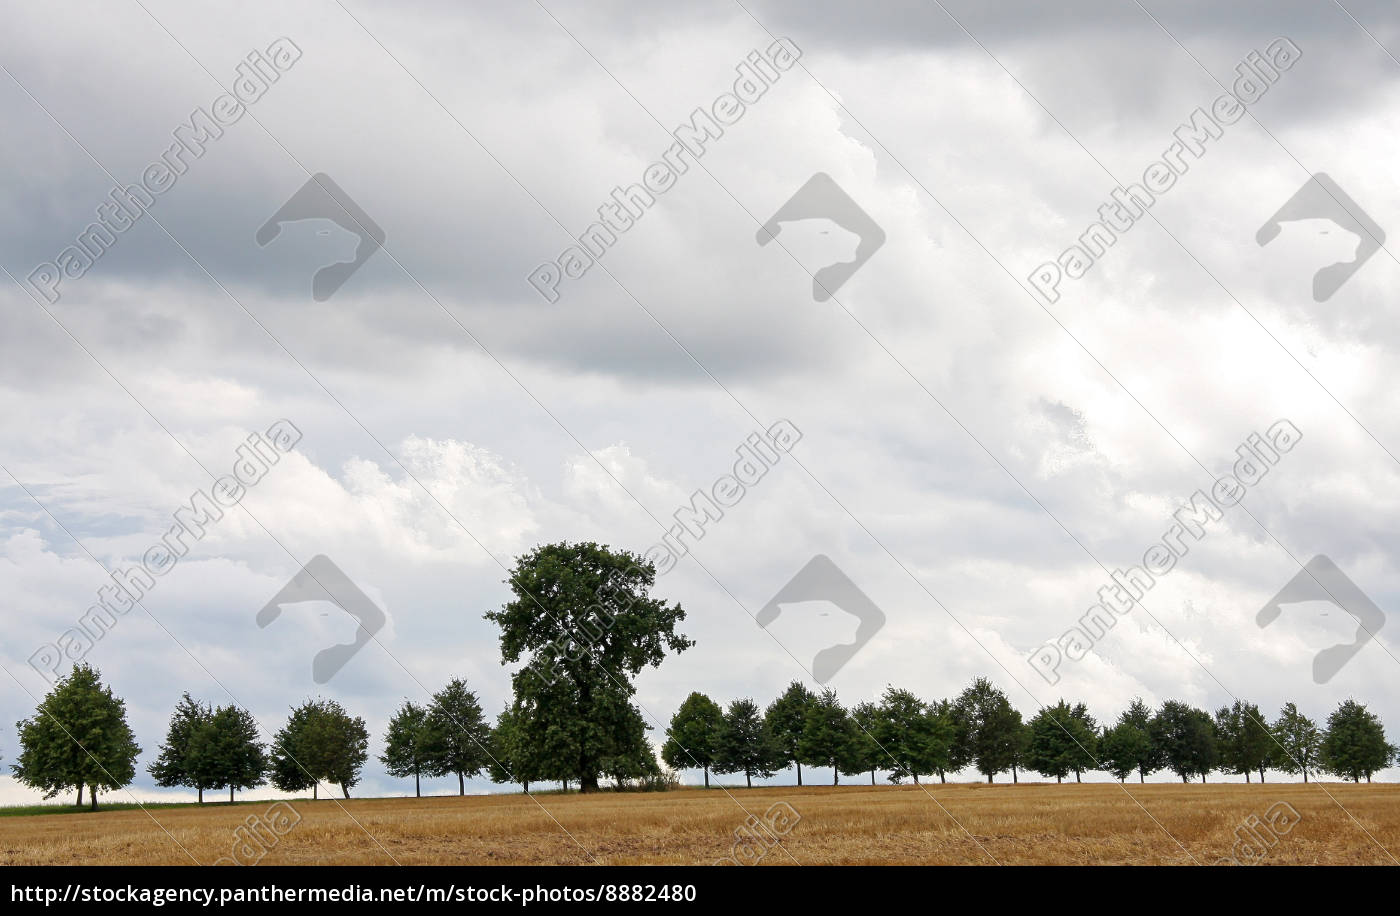 árbol, árboles, campo, verano, veraniego, camino - 8882480